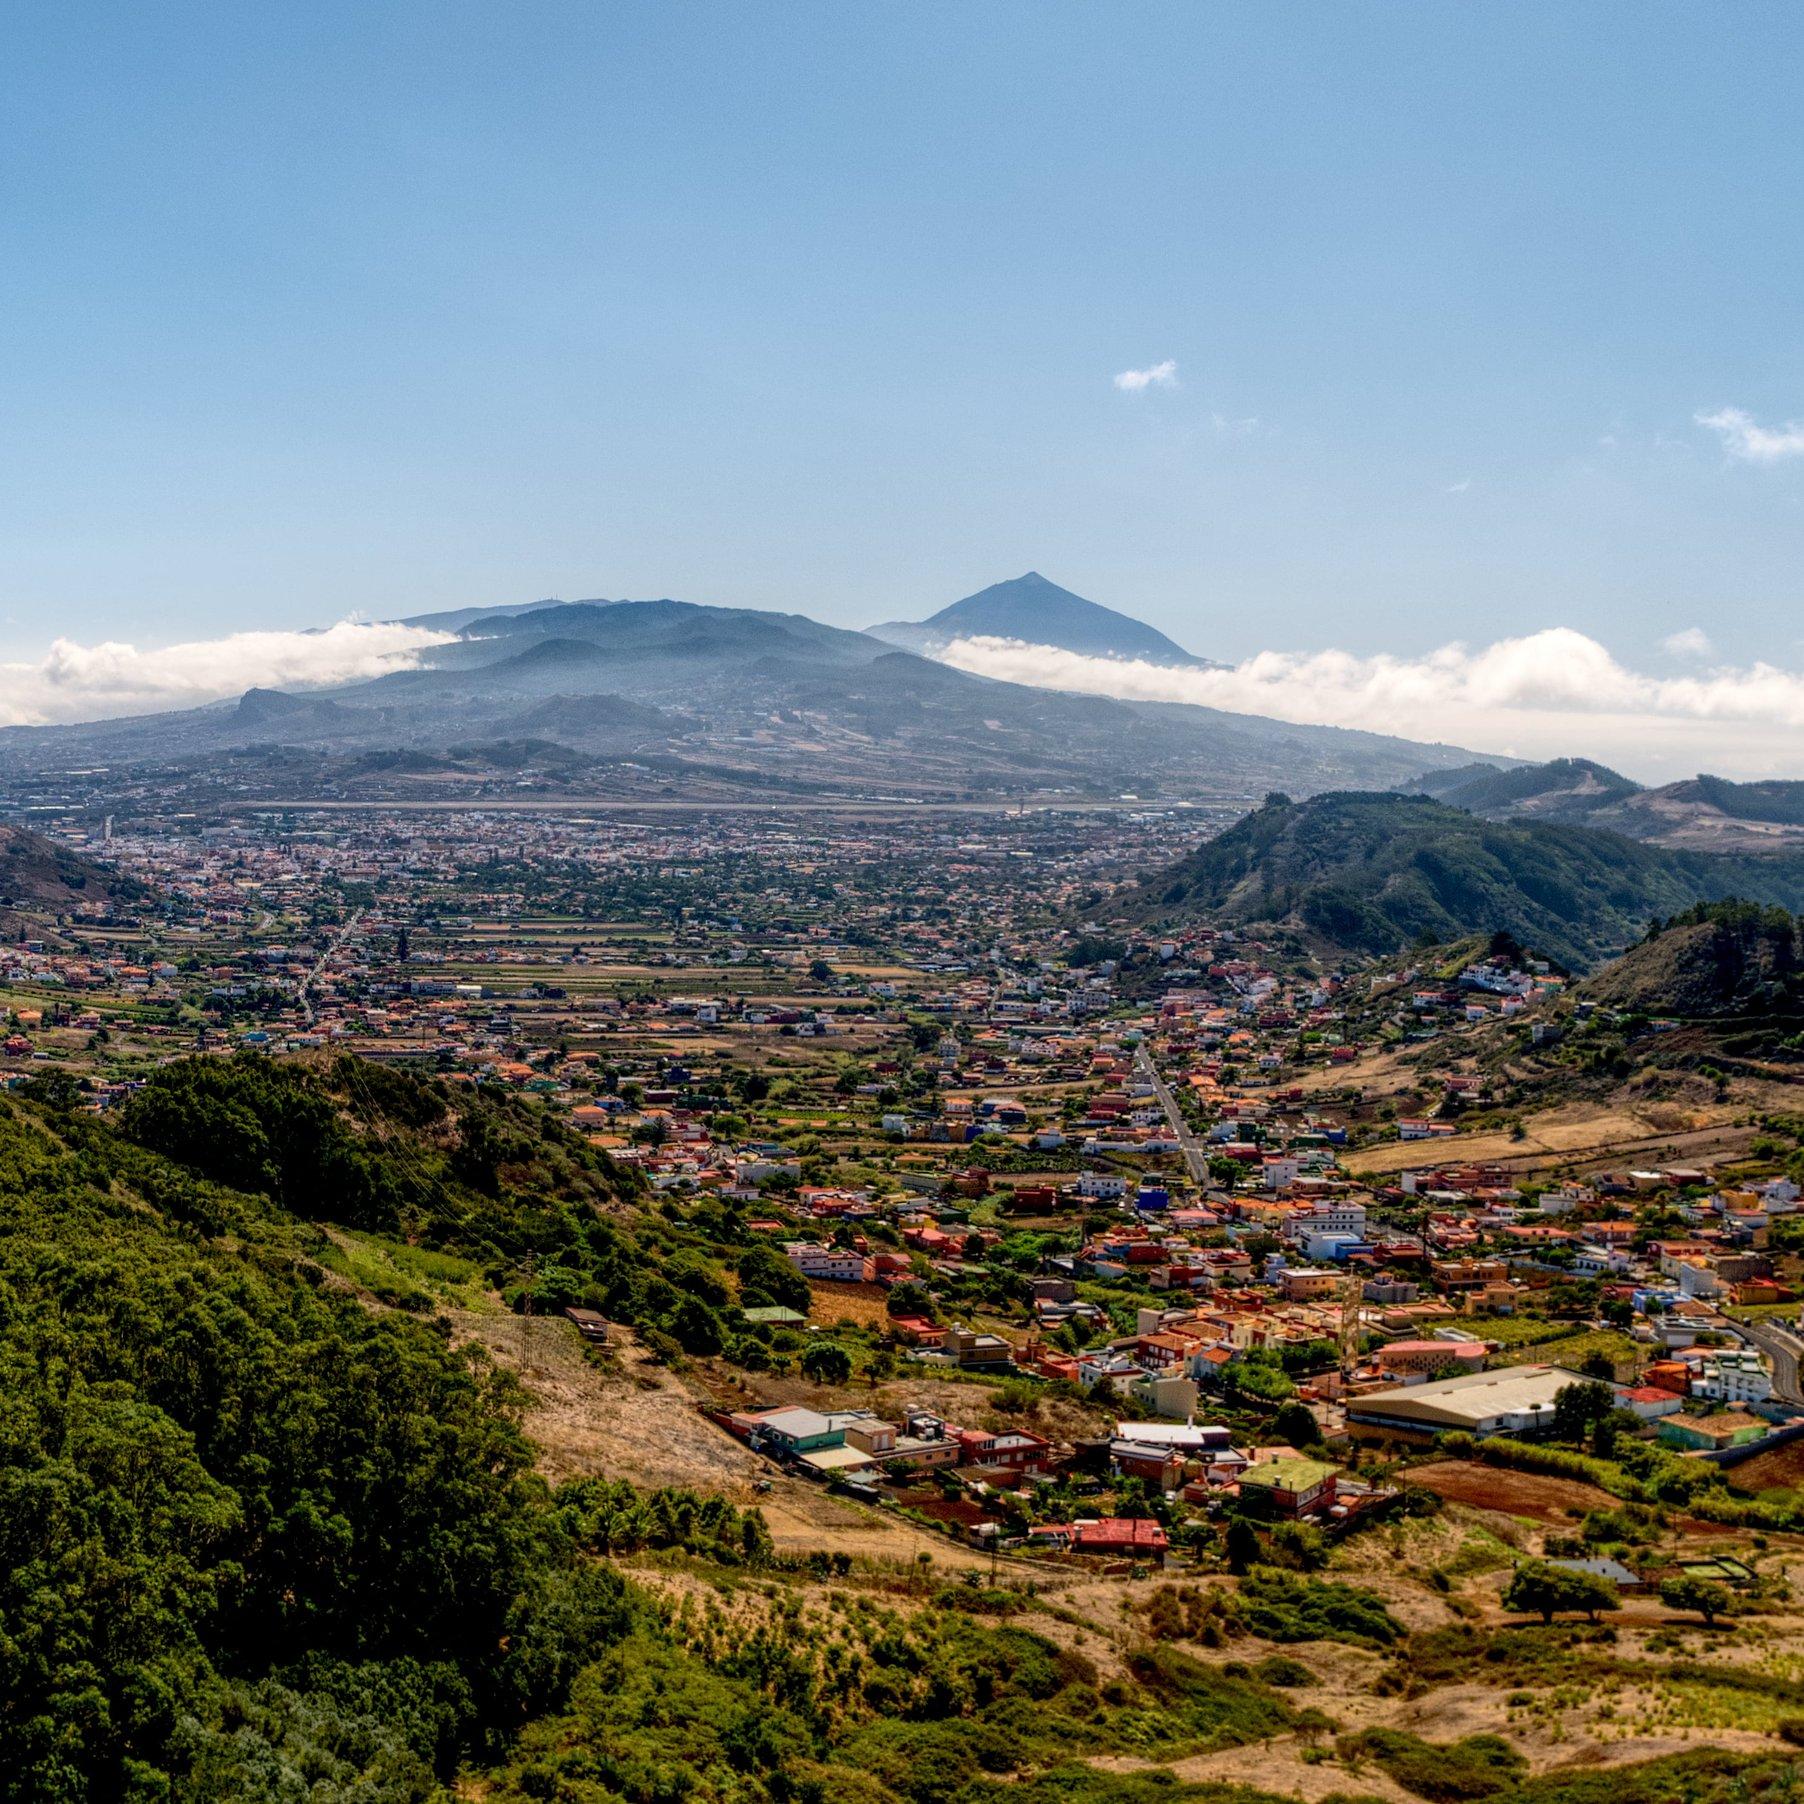 aerial photograph of city near mountain